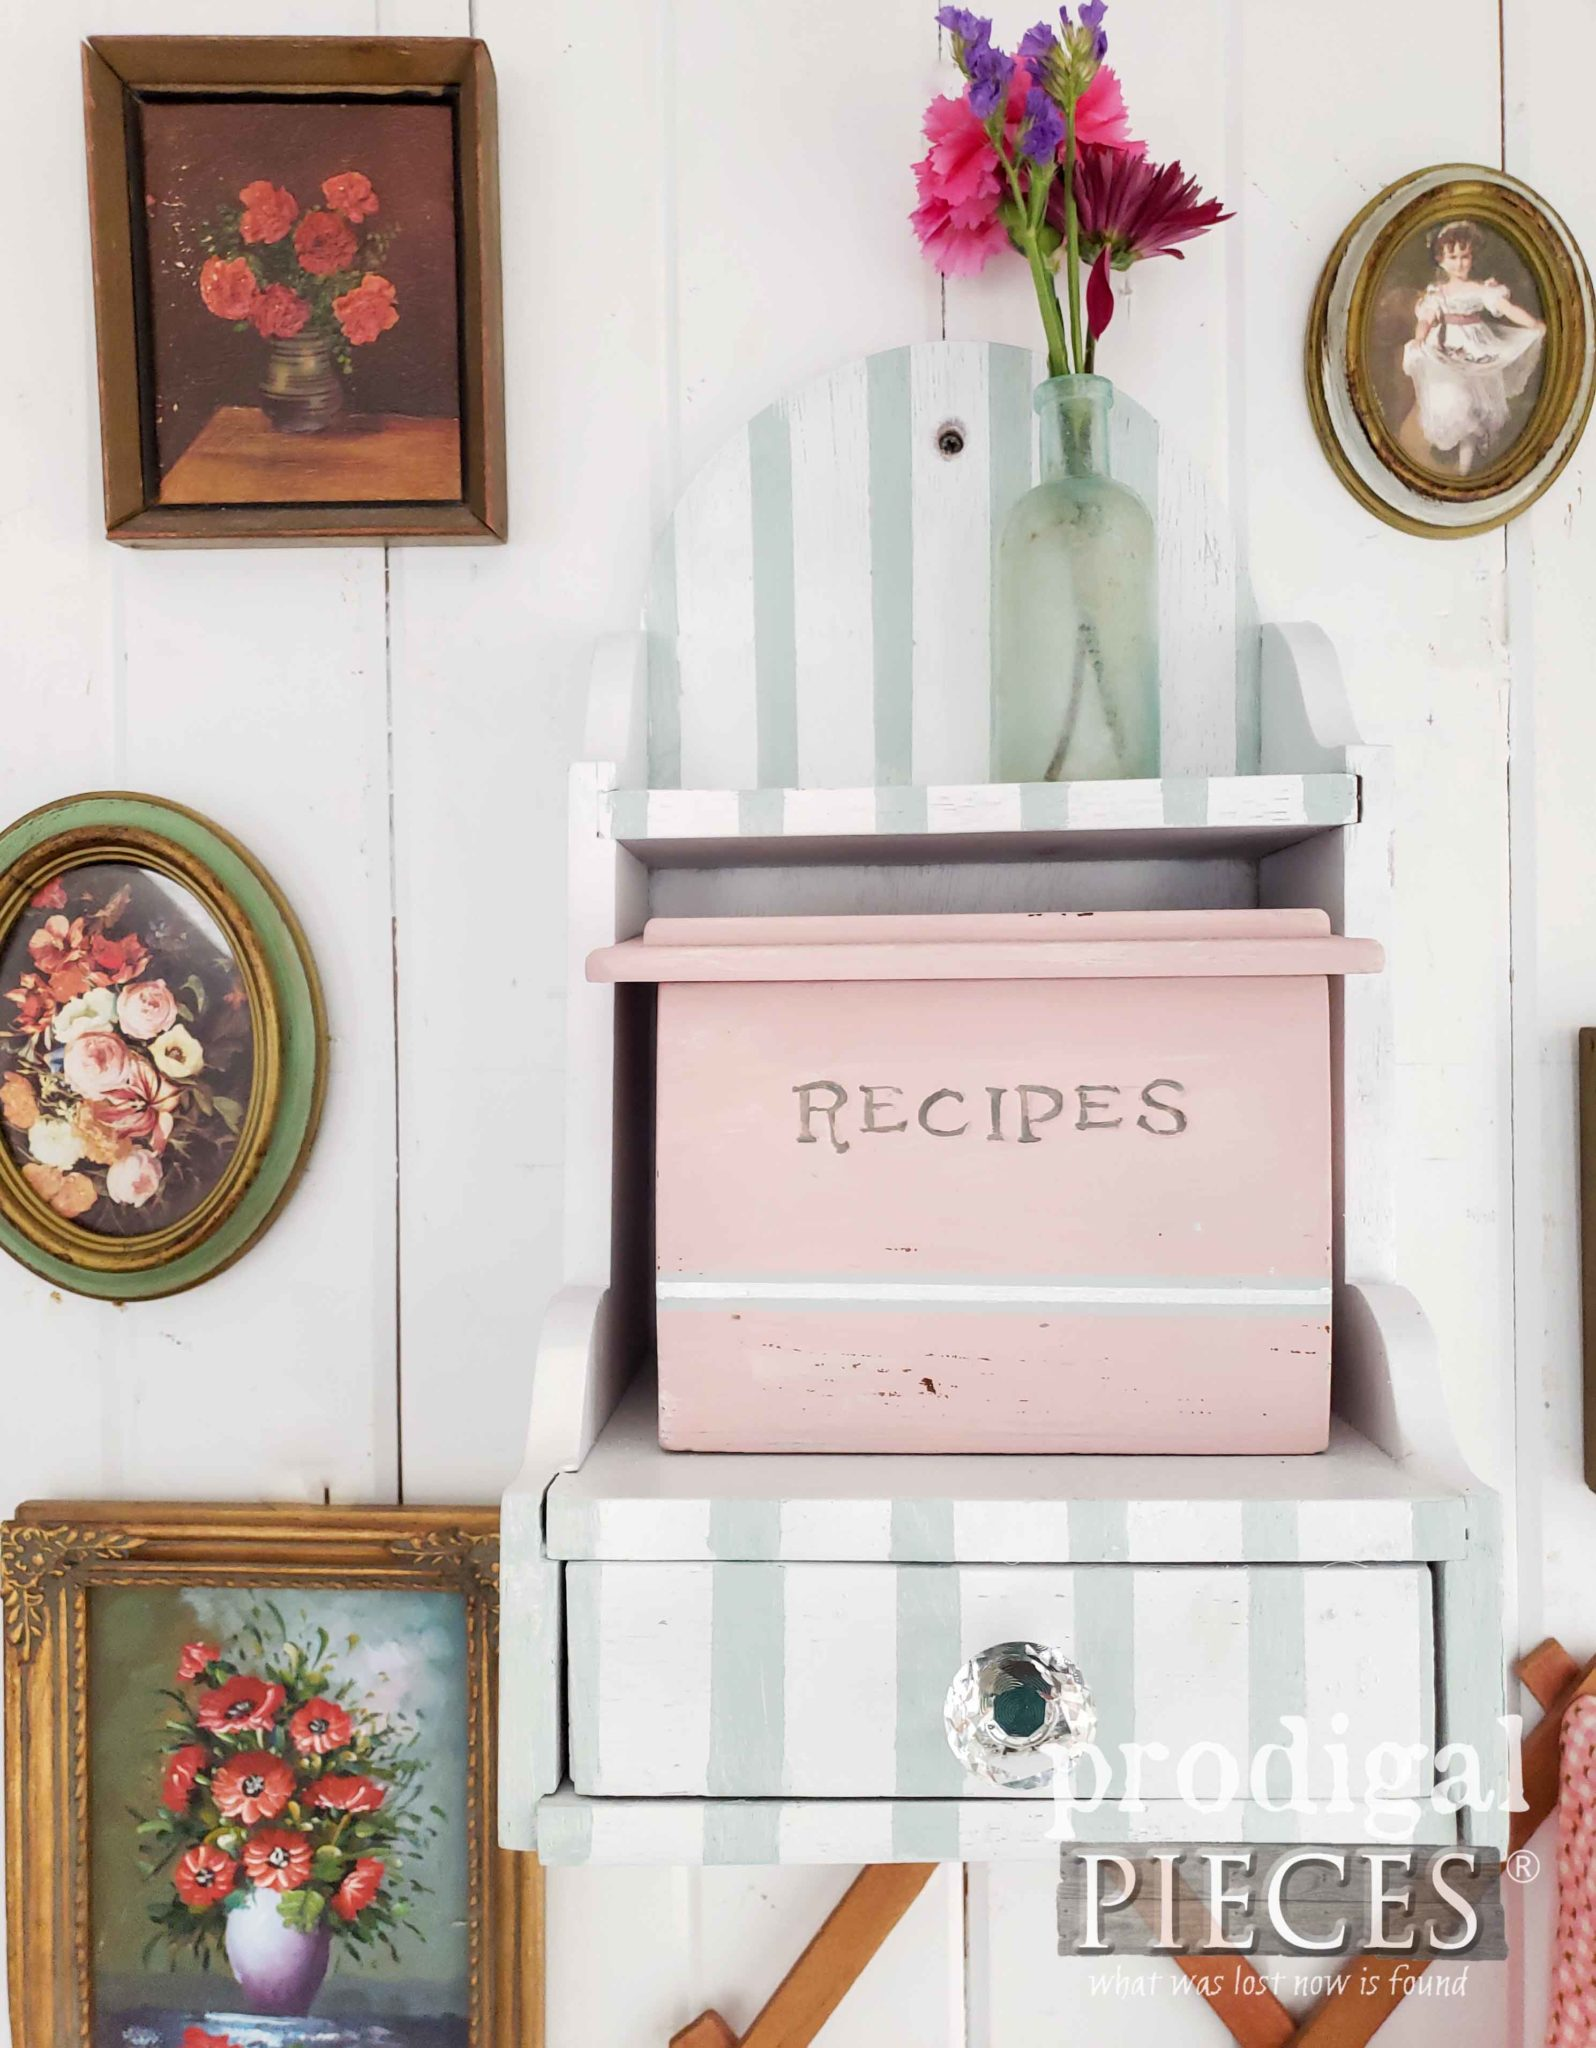 Cottage Chic Recipe Box with Glass Knob and Stripes by Prodigal Pieces | prodigalpieces.com #prodigalpieces #diy #vintage #home #homedecor #handmade